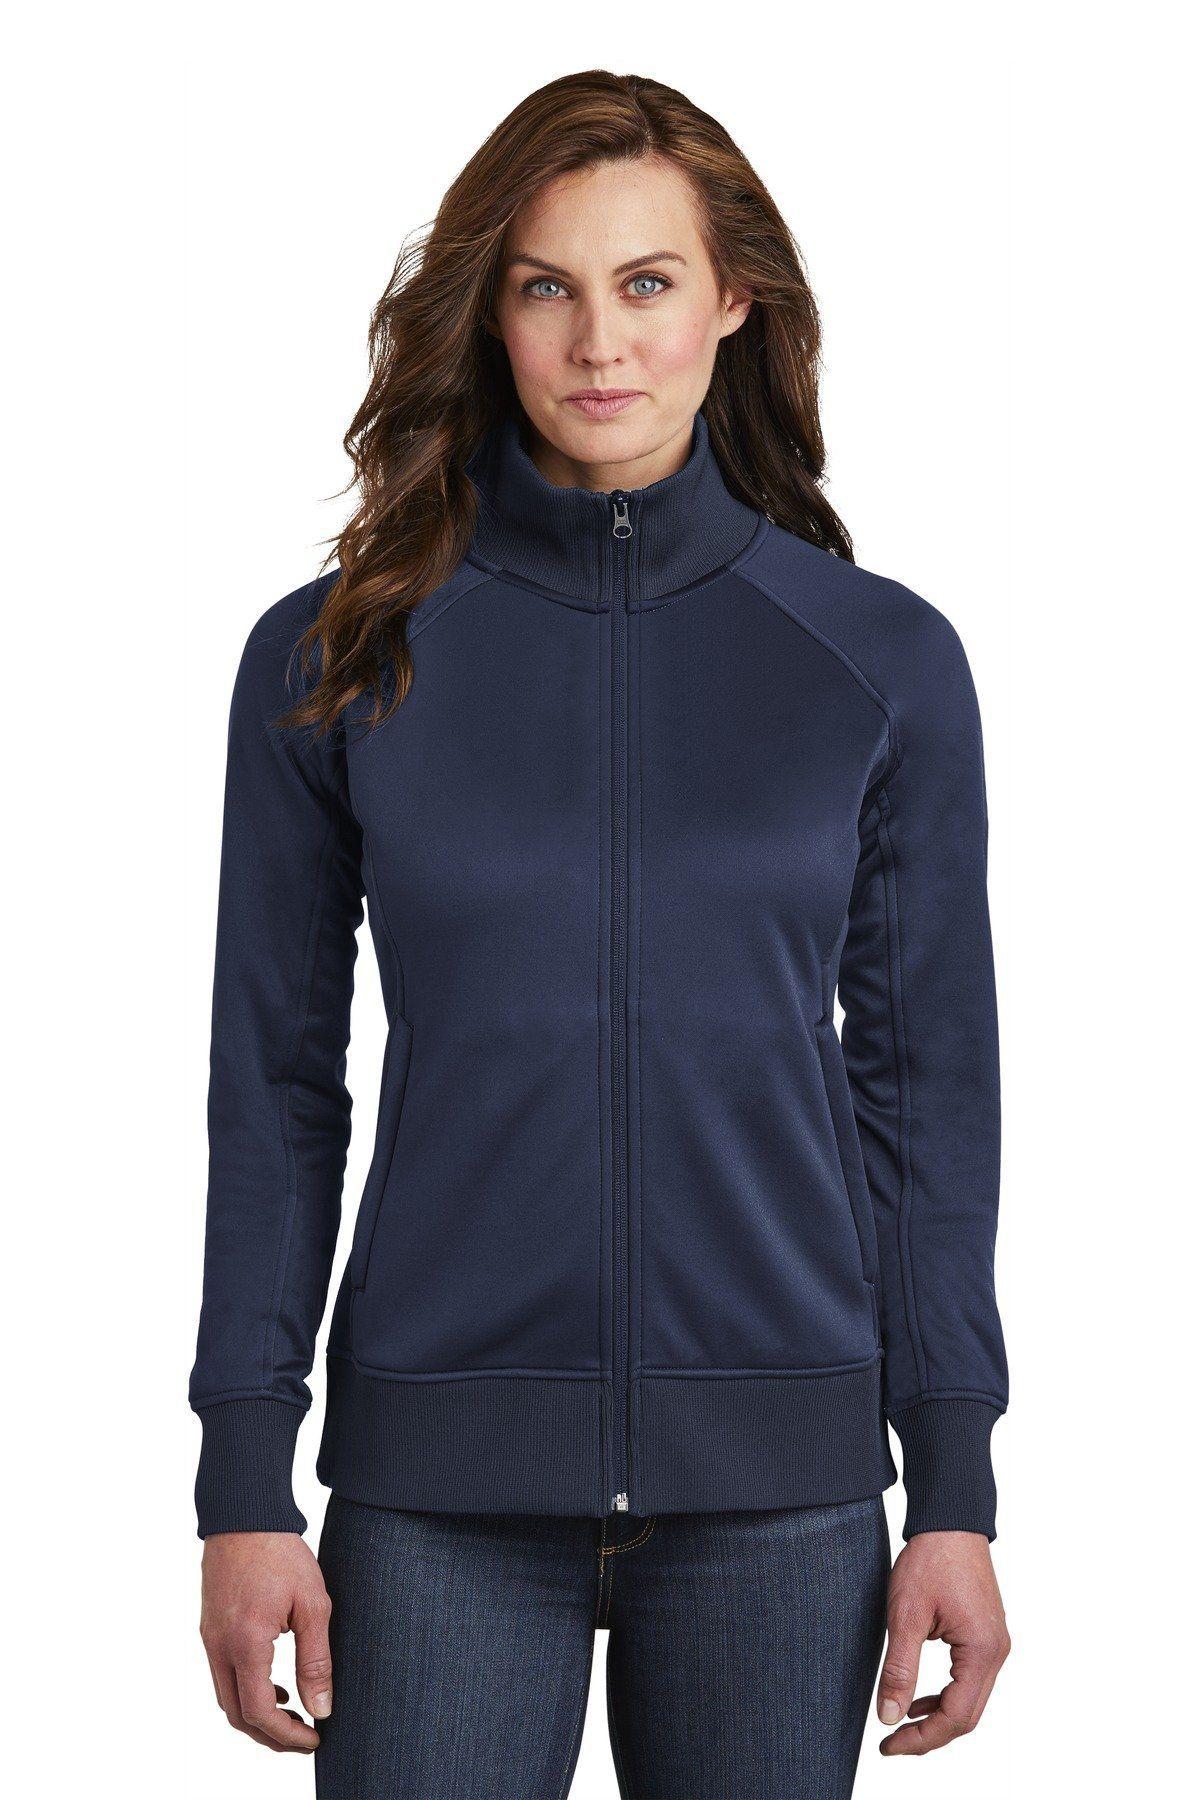 The North Face Ladies Tech FullZip Fleece Jacket NF0A3SEV